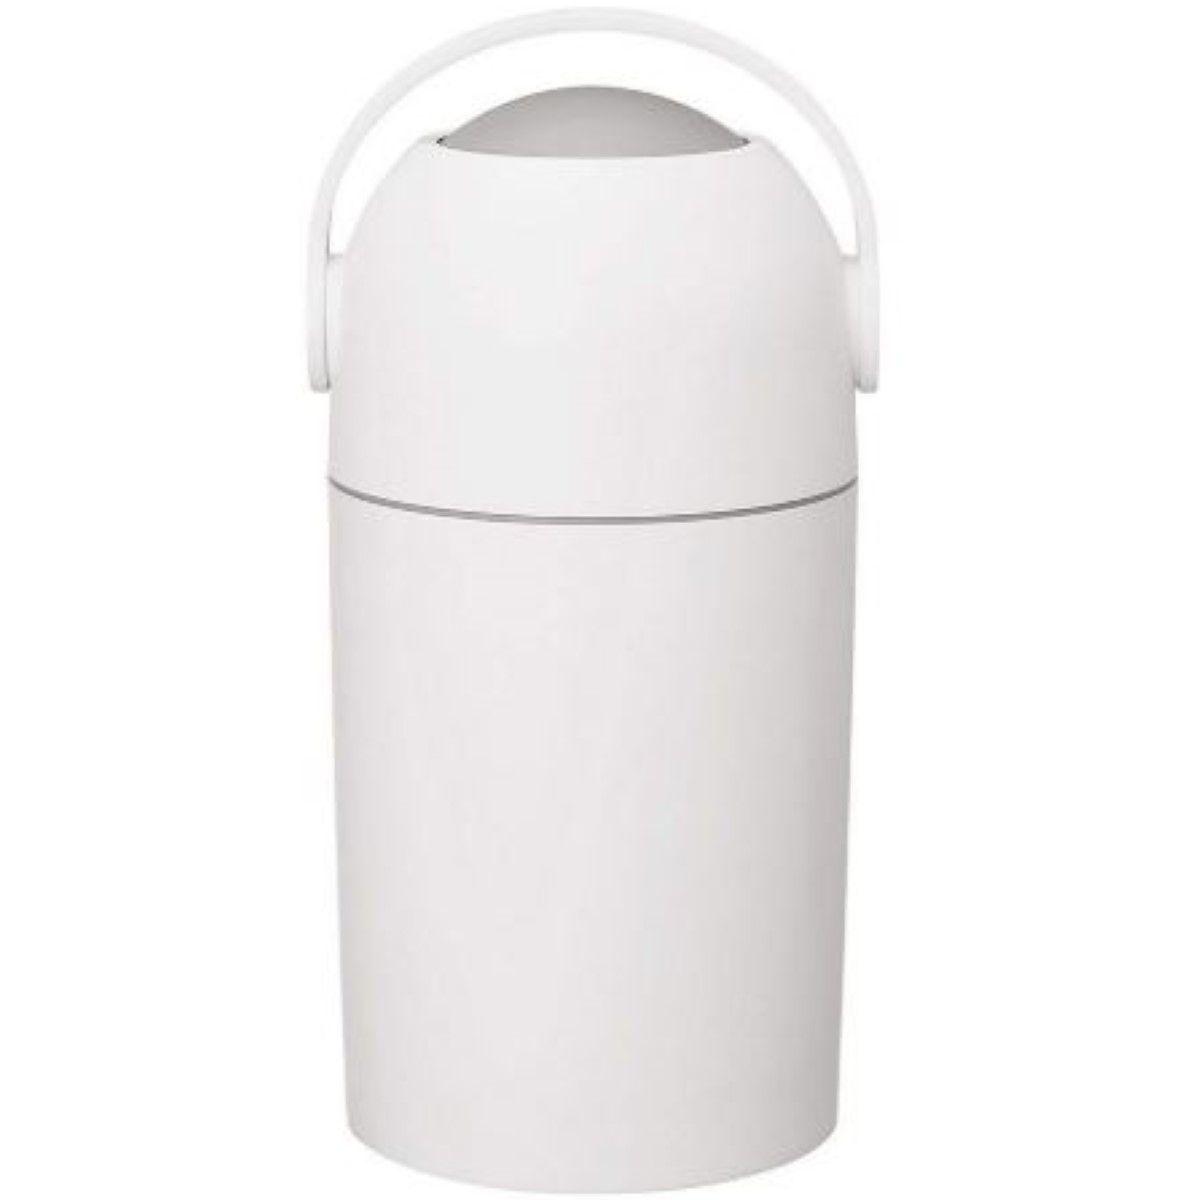 Lixo Magico Ate 20 Fraldas Lixeira Com Sistema Anti Odor Branco Ambiente Cheiroso E Saldavel Para O Bebe Kababy.